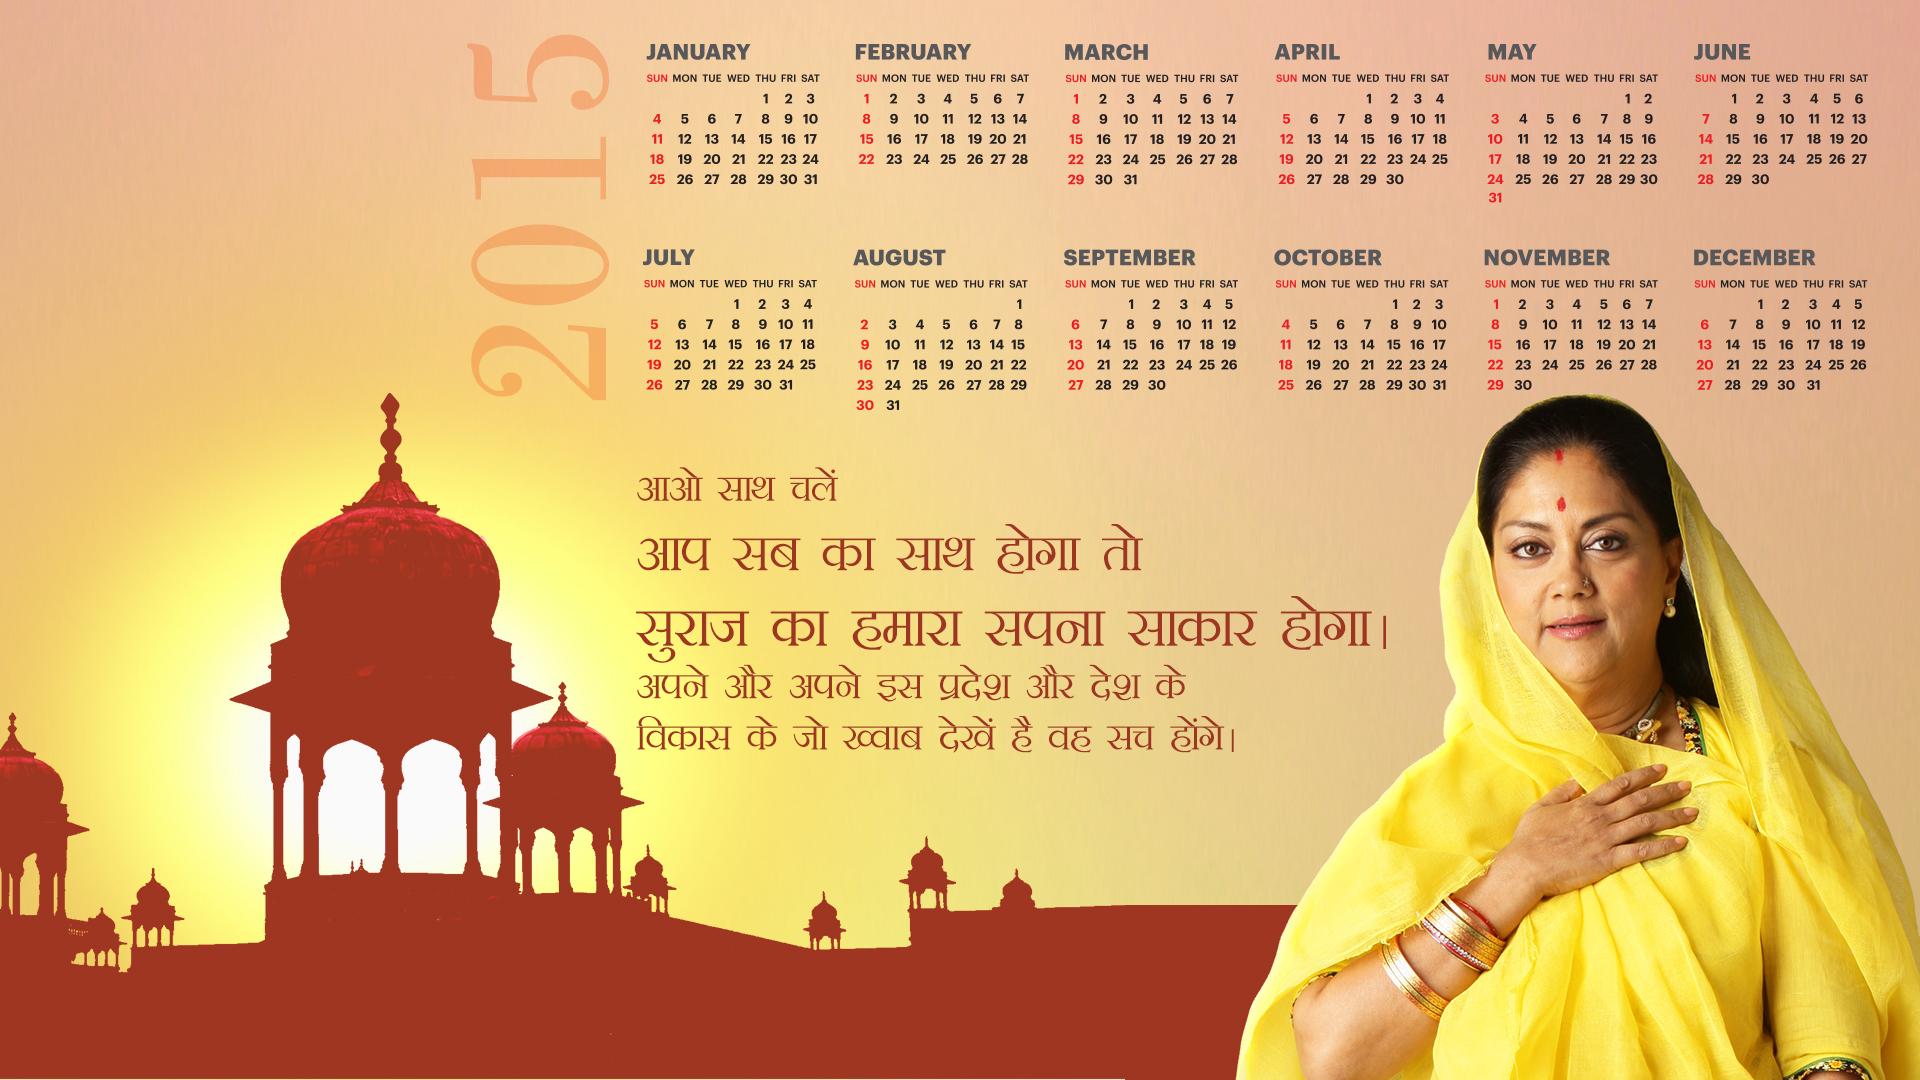 Vasundhara Raje Calendar 2015